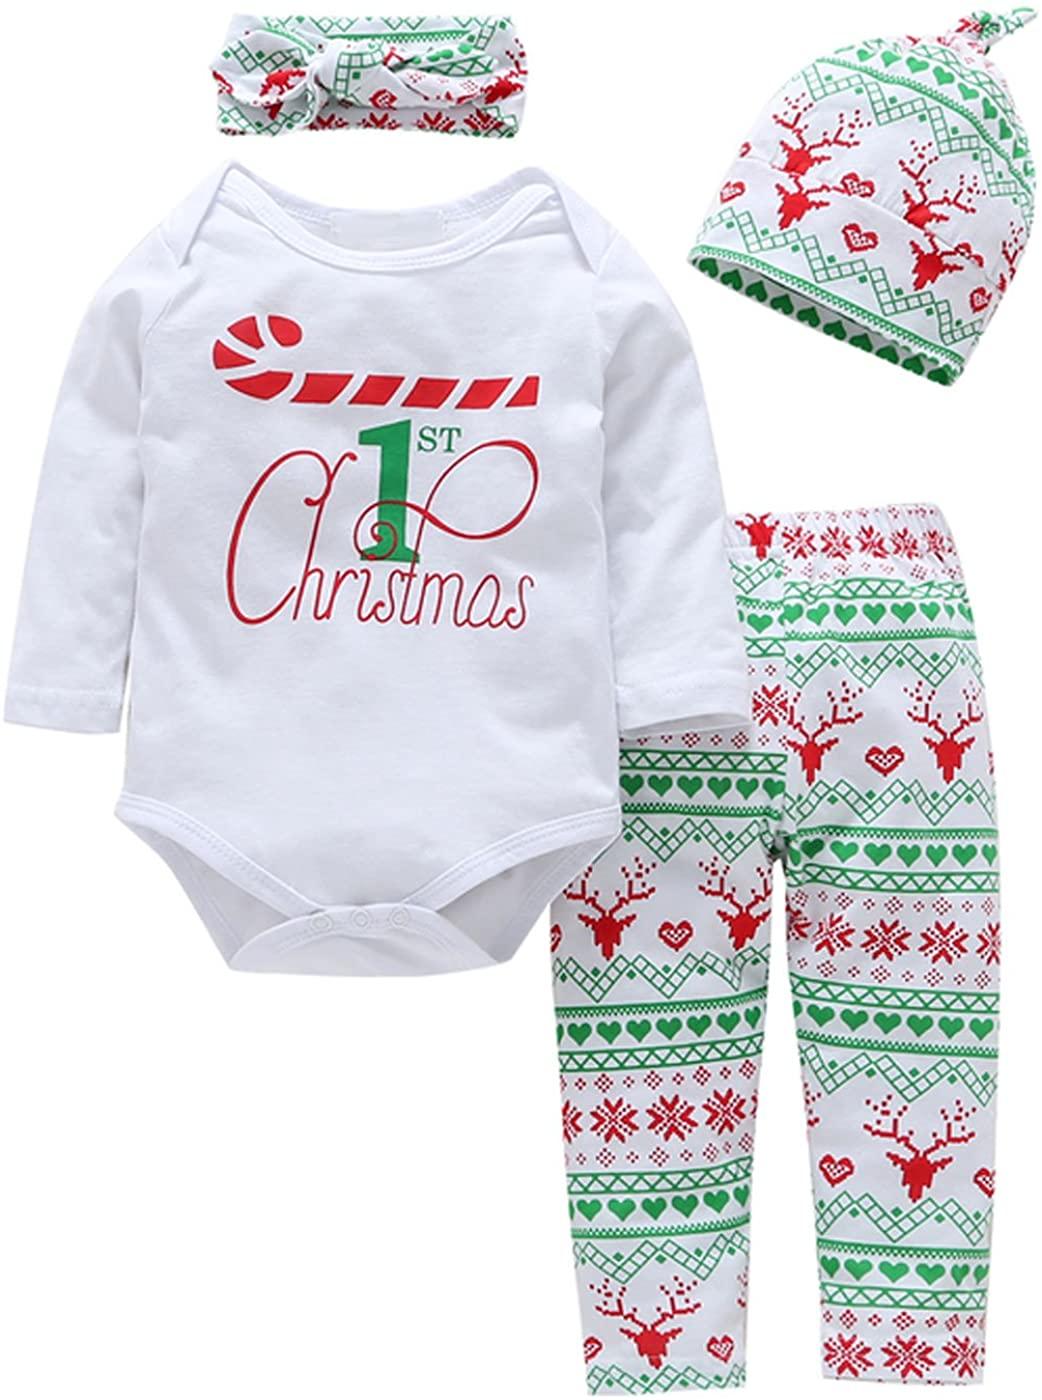 Infant Baby Boy Girl 4 pcs Clothes Set My First Christmas Long Sleeve Romper+ Deer Pants+Hat+Headband